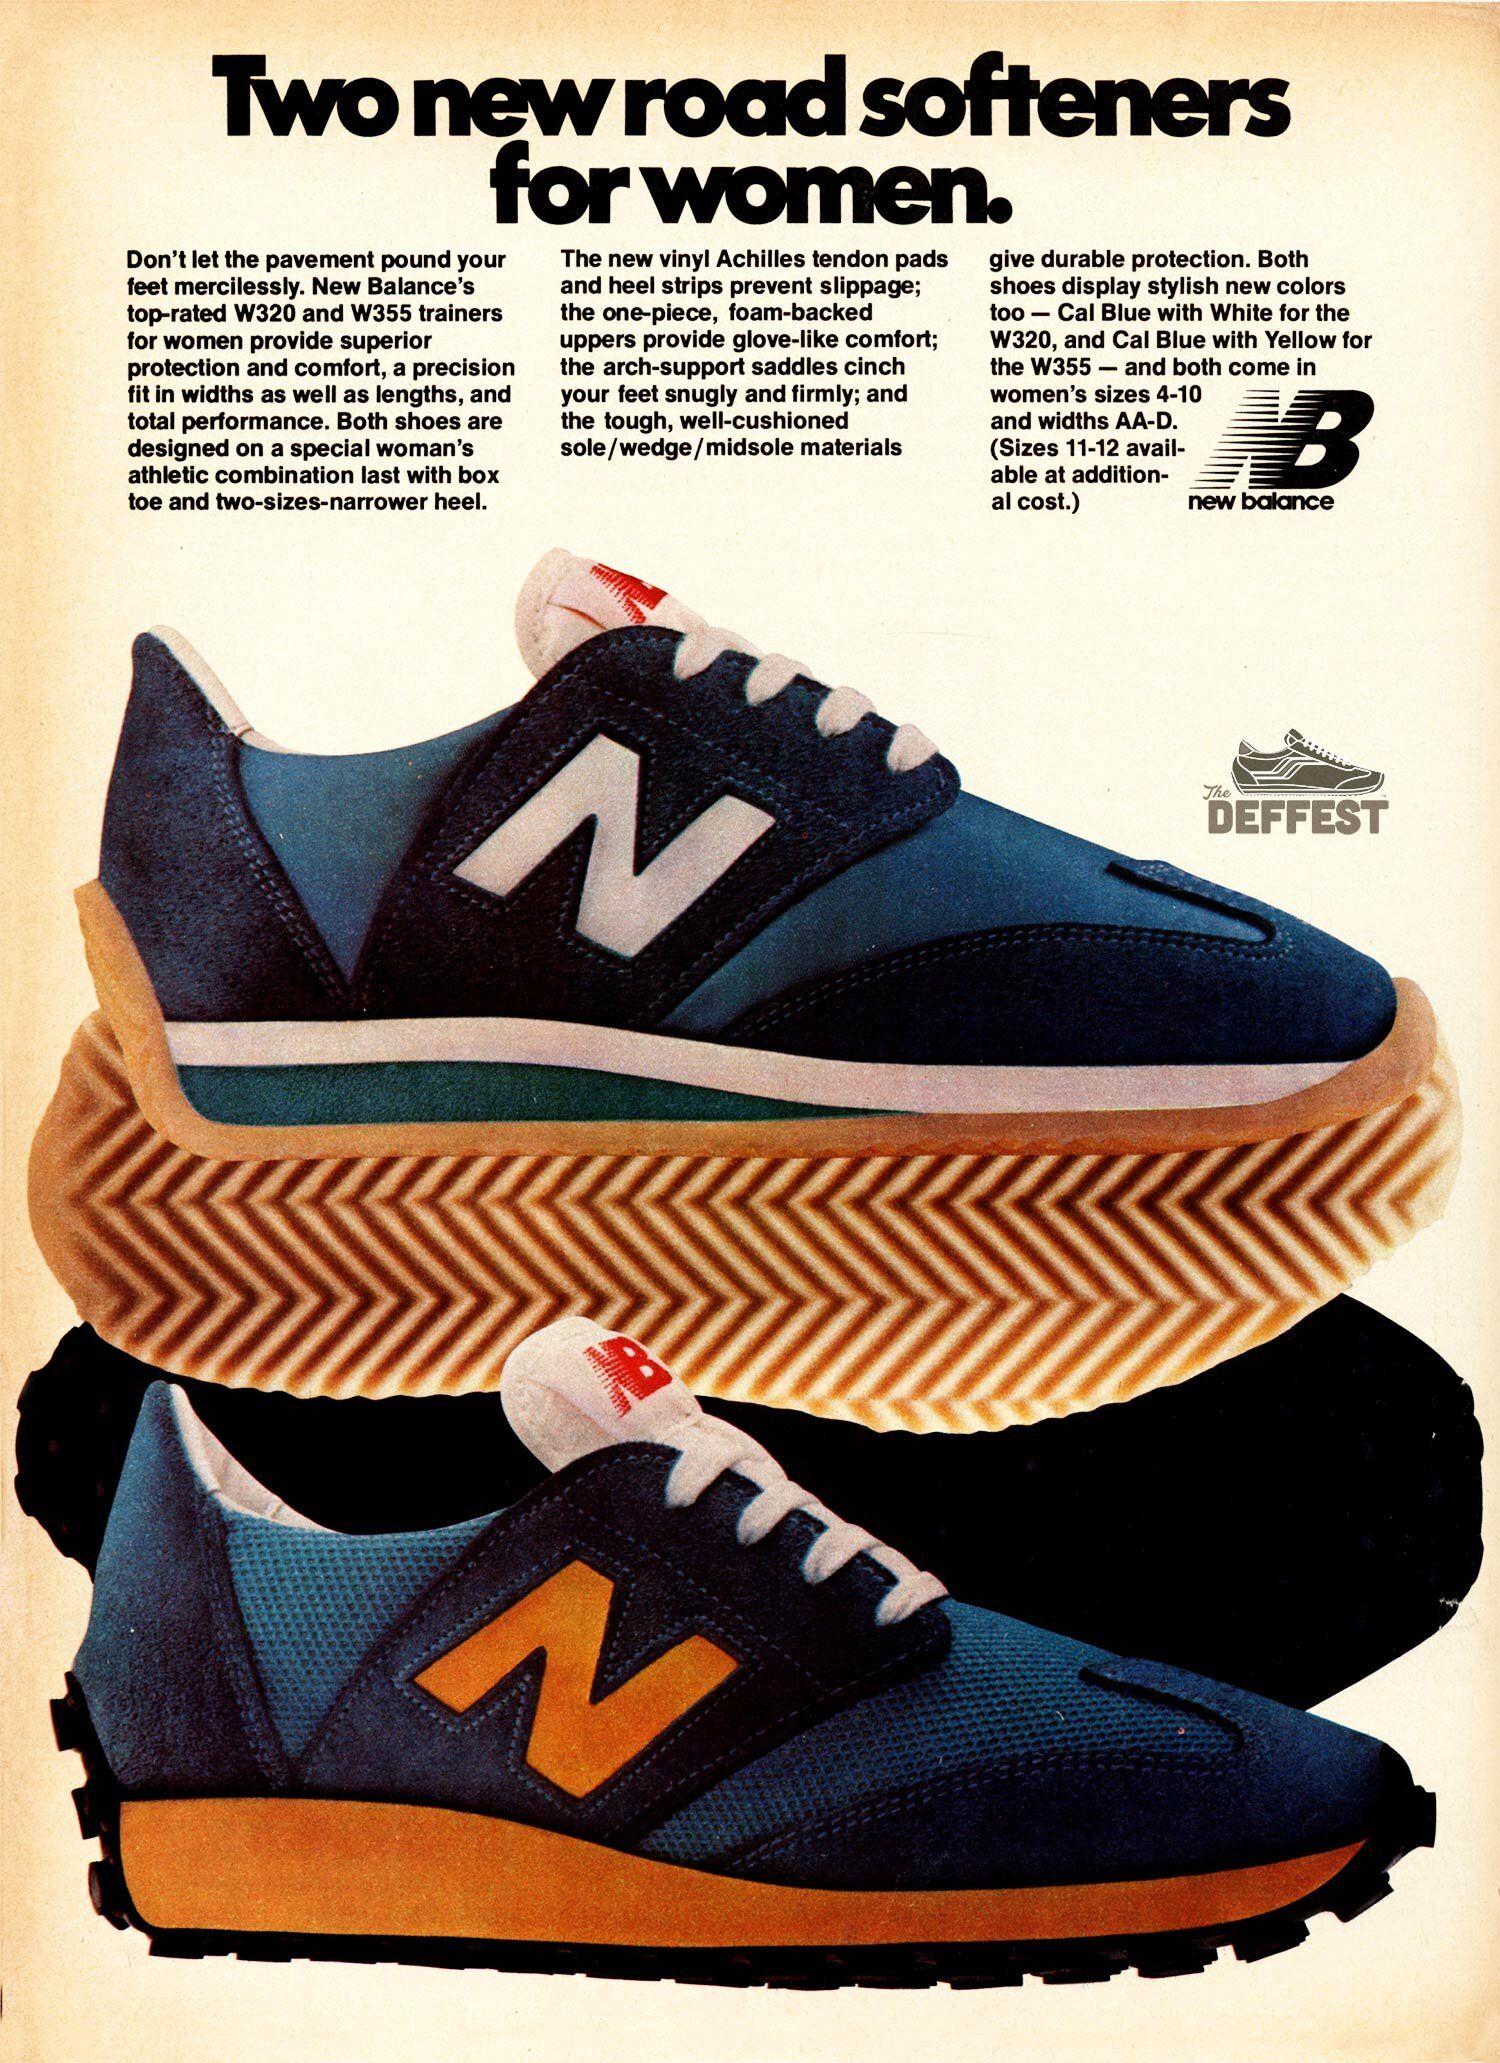 New Balance 1979 W320 and W355 vintage